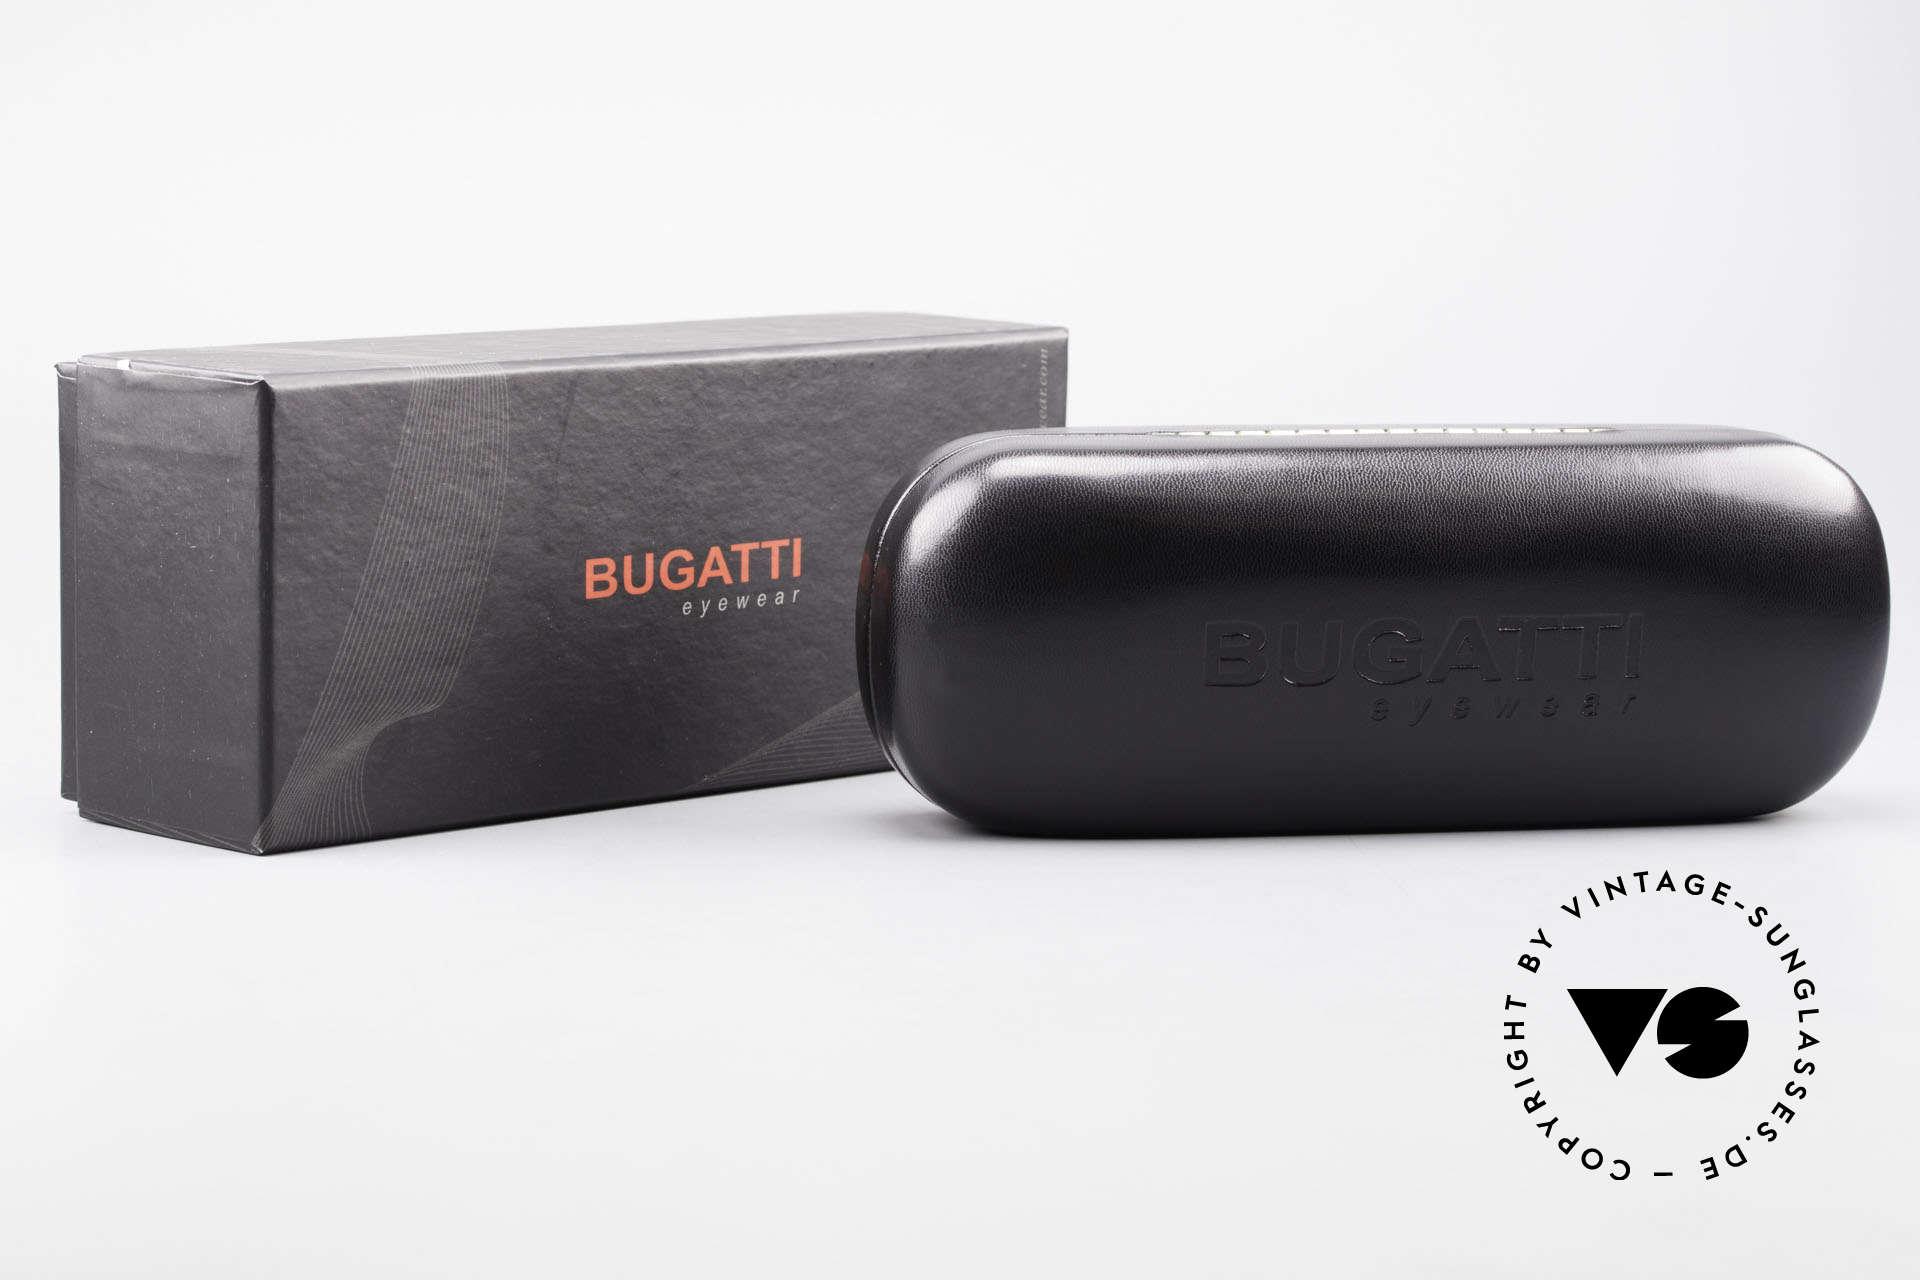 Bugatti 10892 Vintage Men's Eyeglasses 90's, Size: extra large, Made for Men